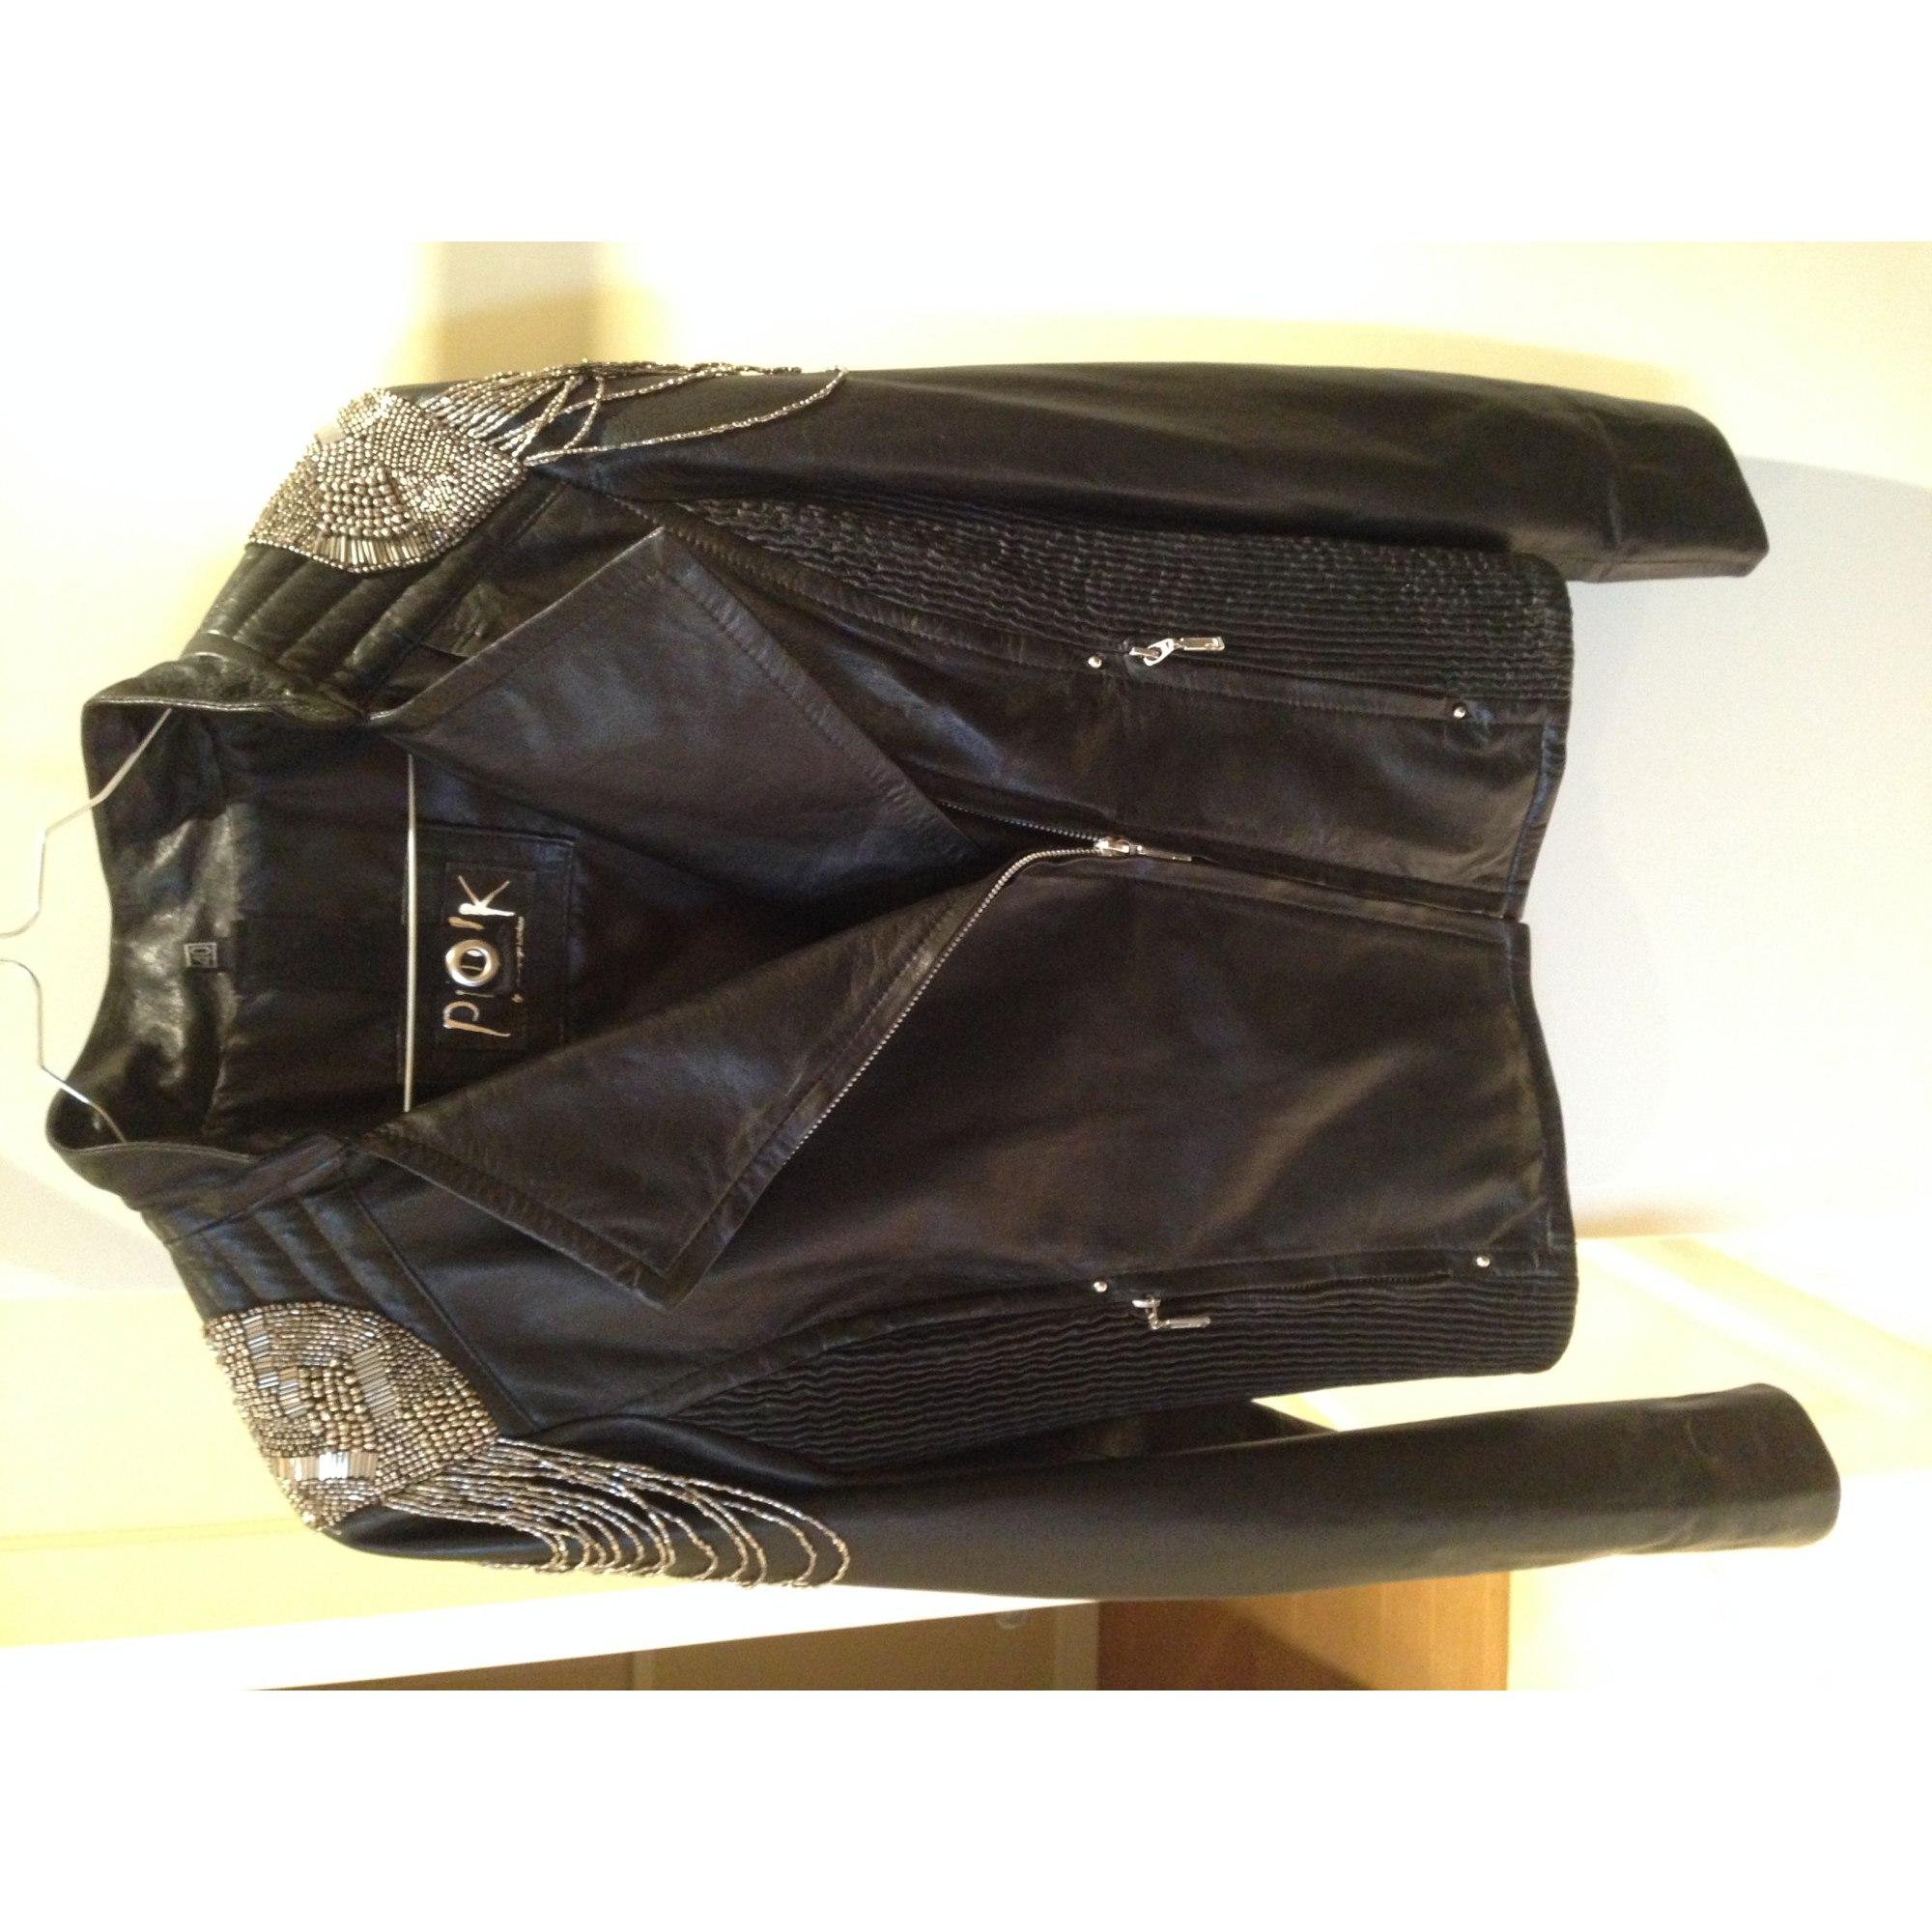 vente chaude en ligne 67cec 2b998 Veste en cuir PUNK BY CAMOUFLAGE DELUXE